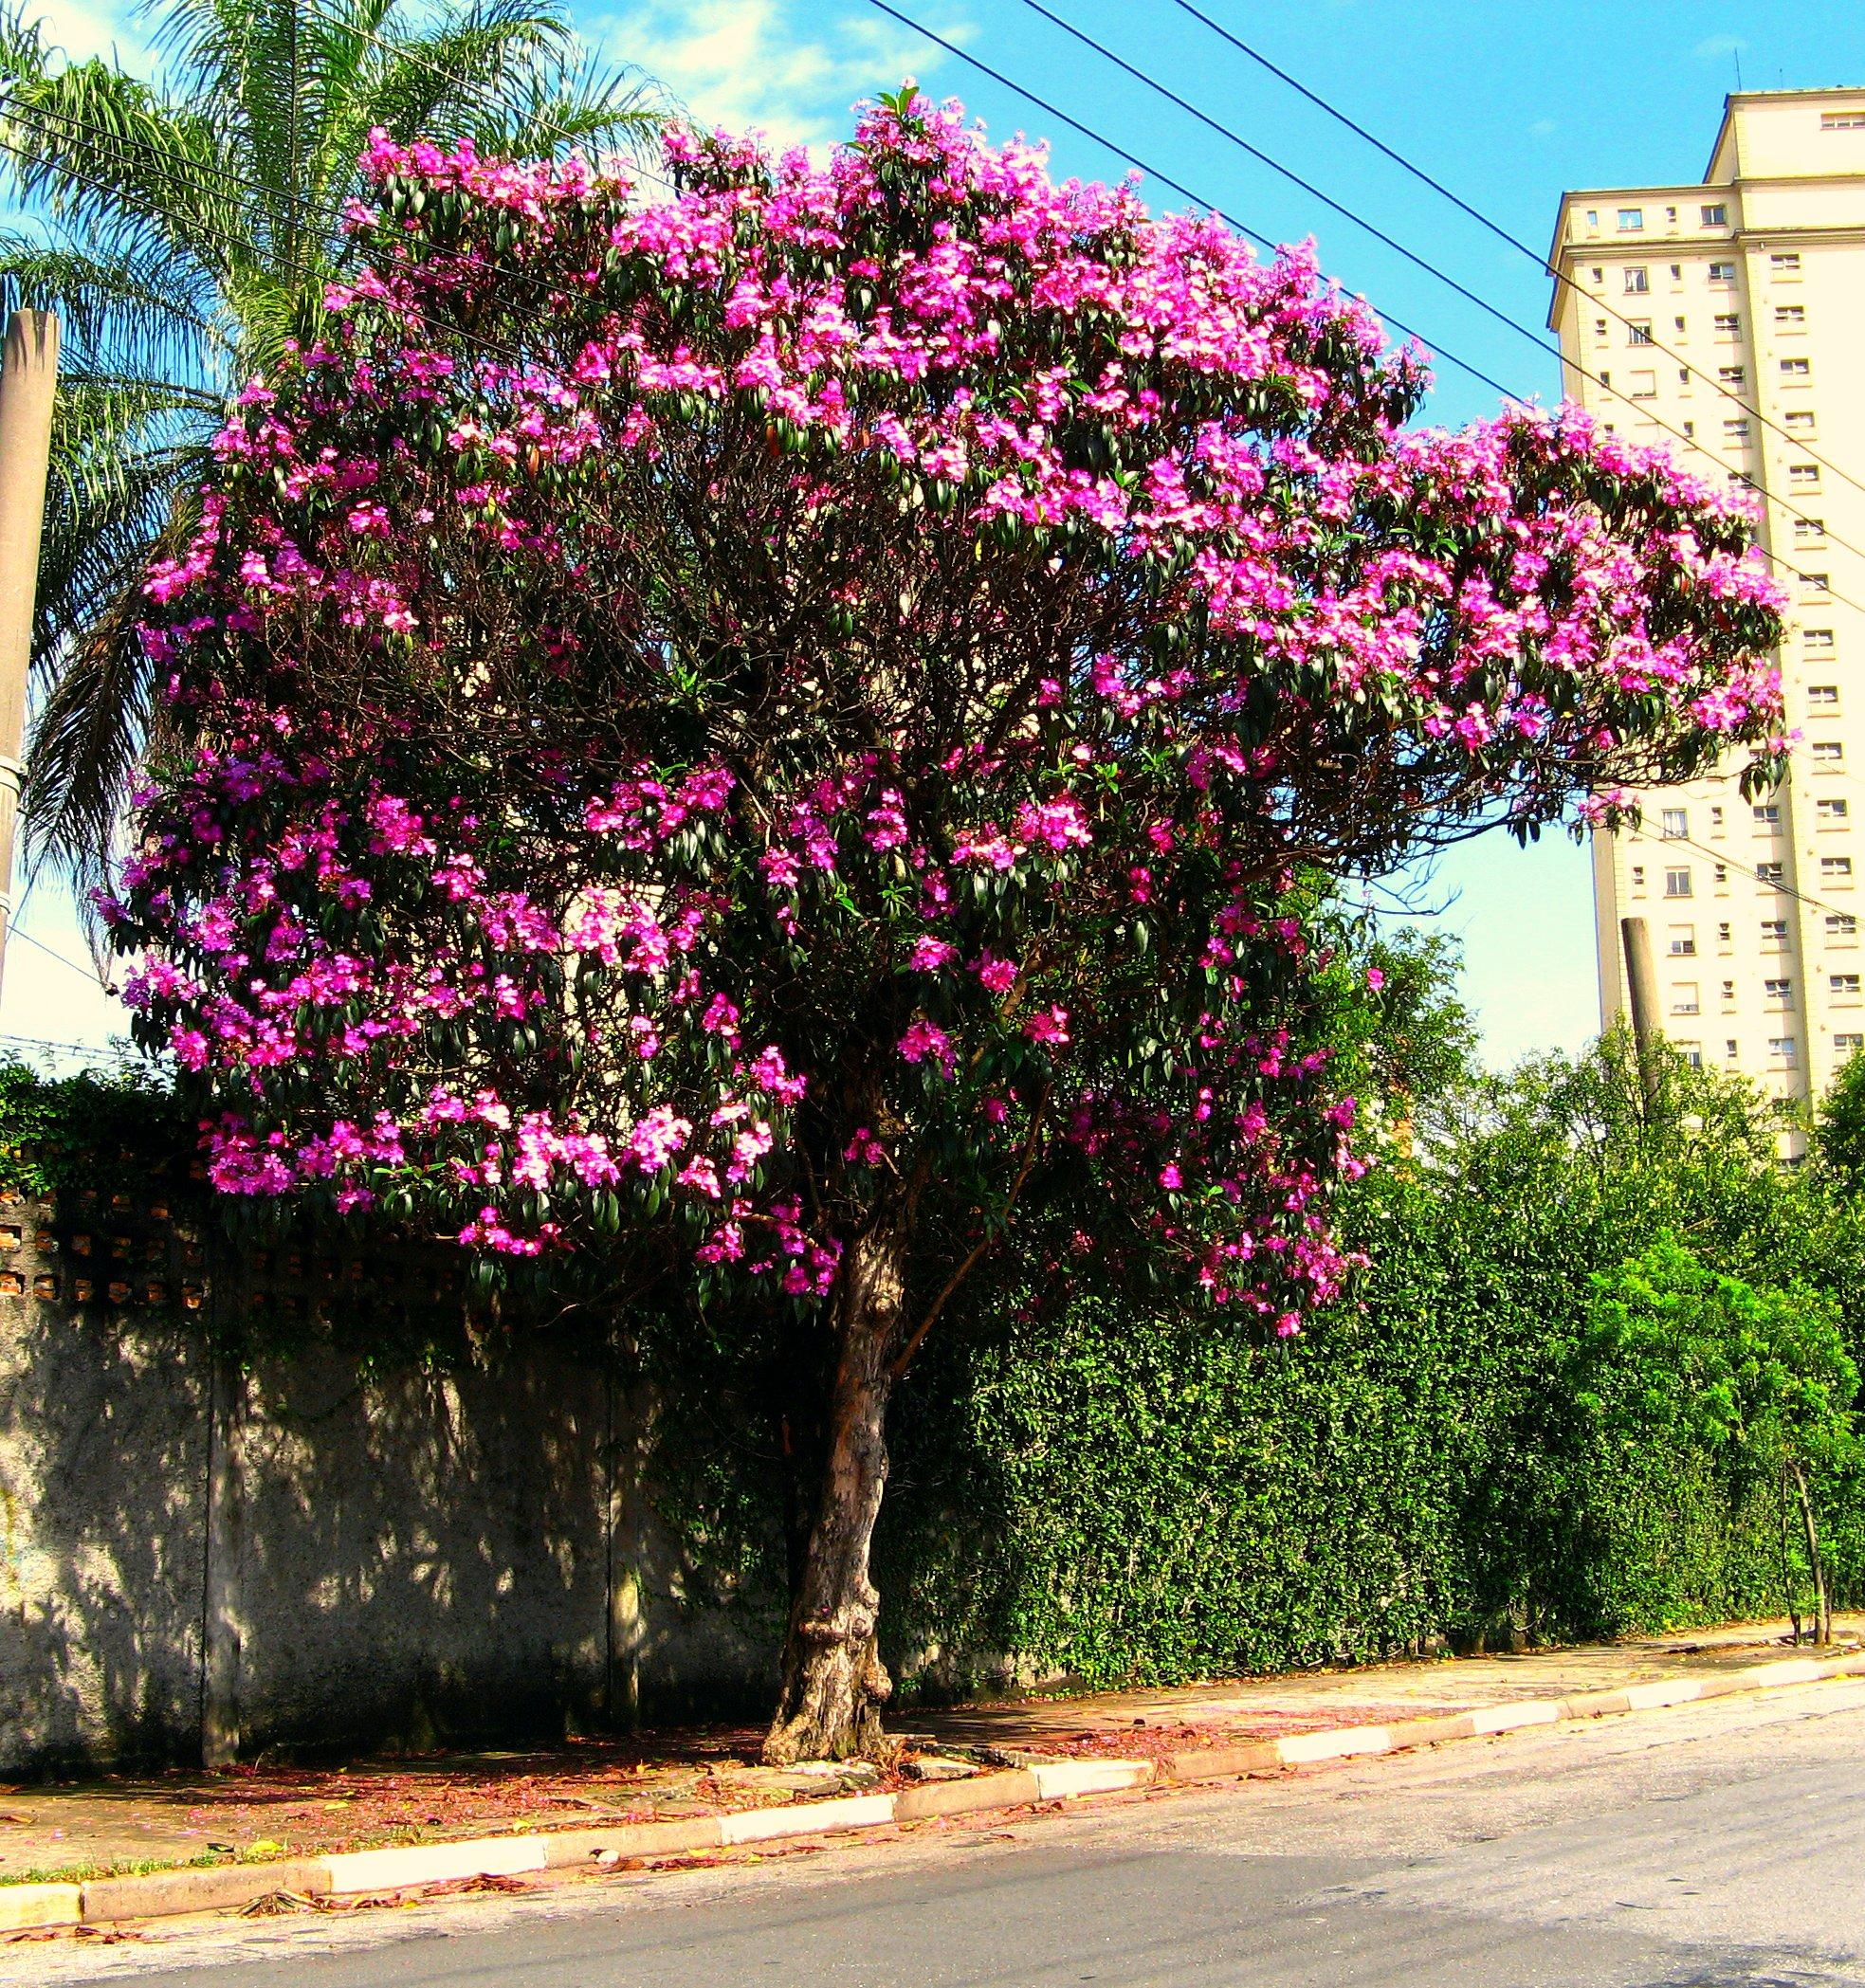 http://upload.wikimedia.org/wikipedia/commons/e/e9/Tibouchina_Granulosa_Kathleen.jpg